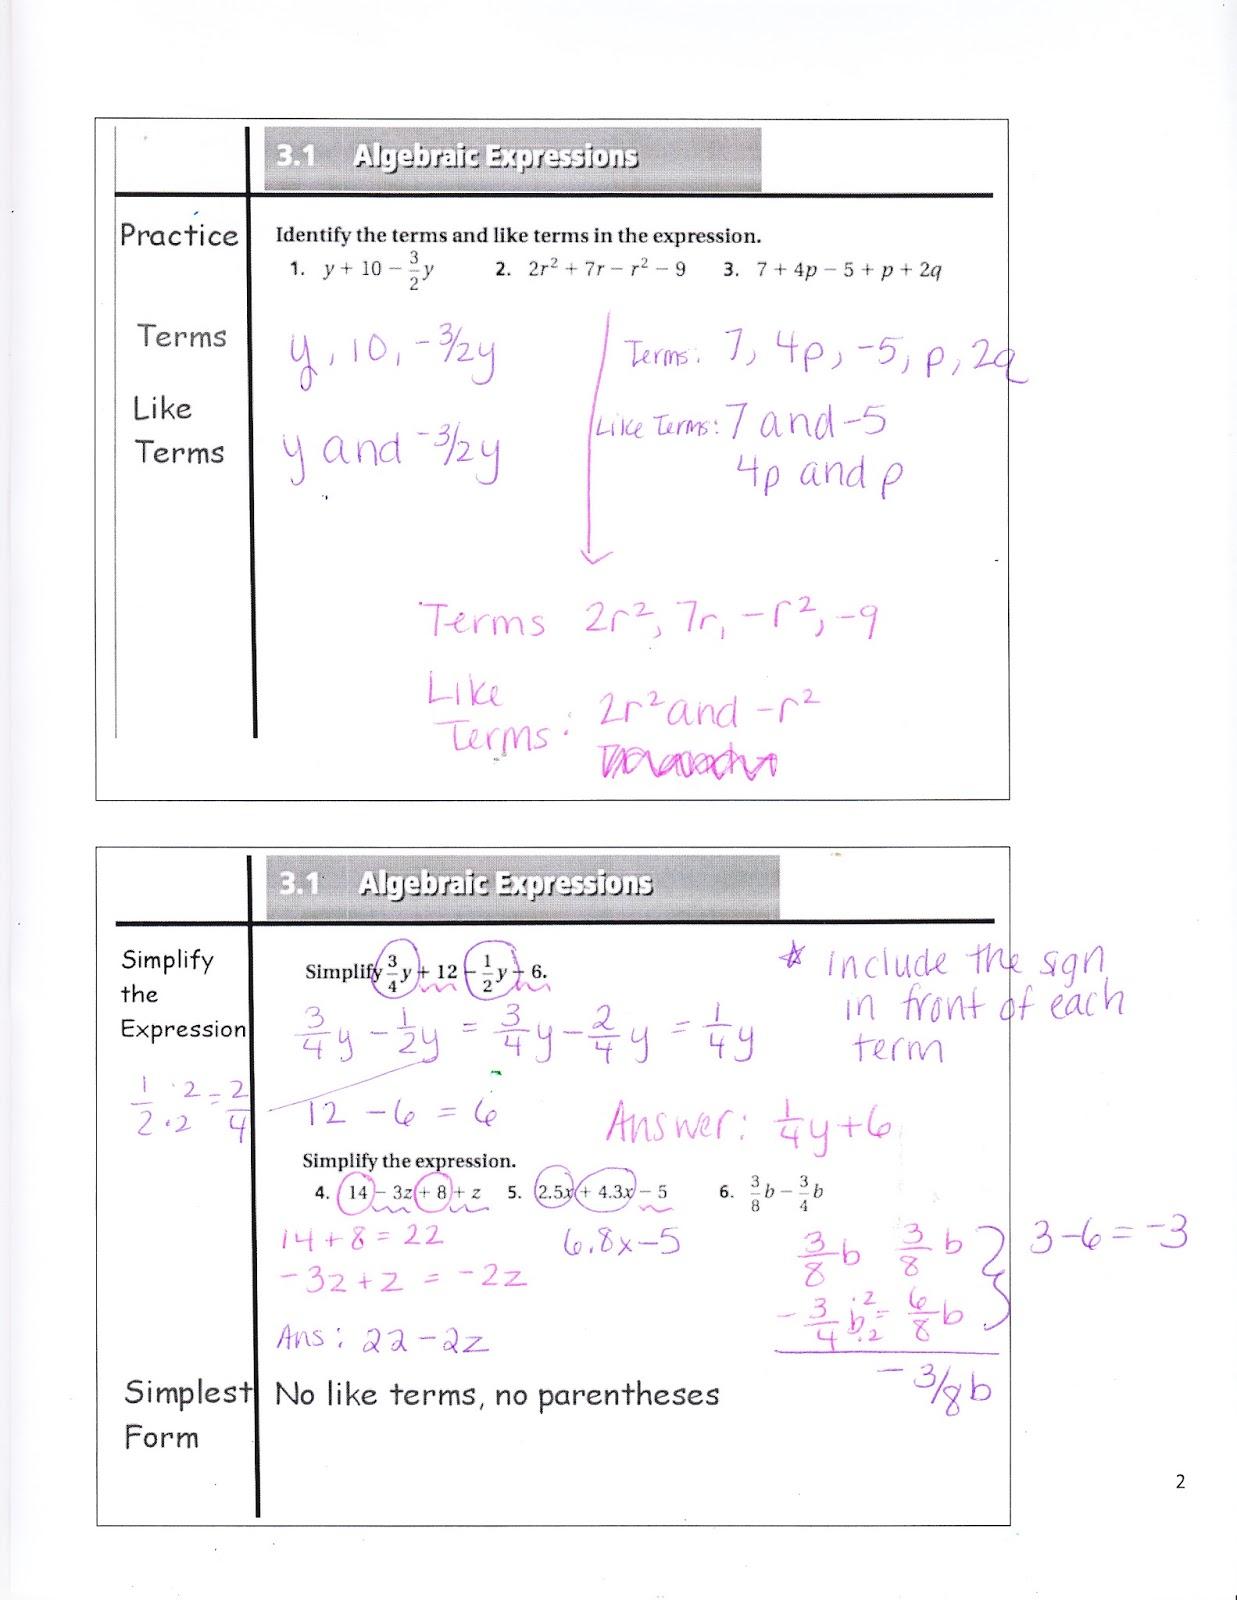 Ms. Jean's Classroom Blog: 3.1 Algebraic Expressions